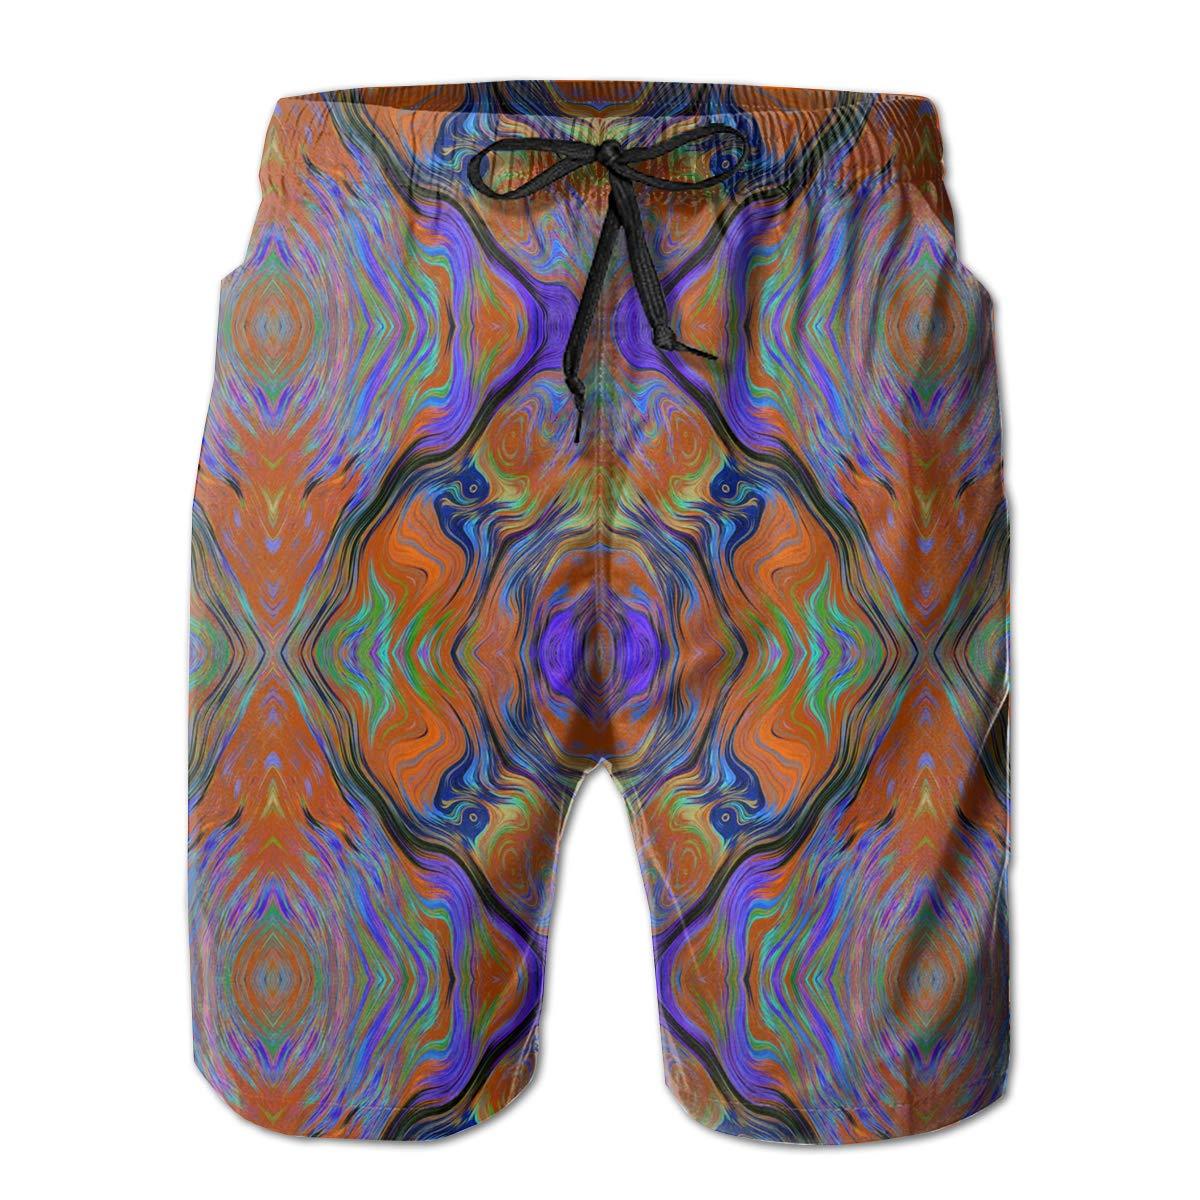 WMDJEG Lava LAMP Purple Orange Burnt Mens Summer Beachwear Sports Running Swim Board Shorts Mesh Lining